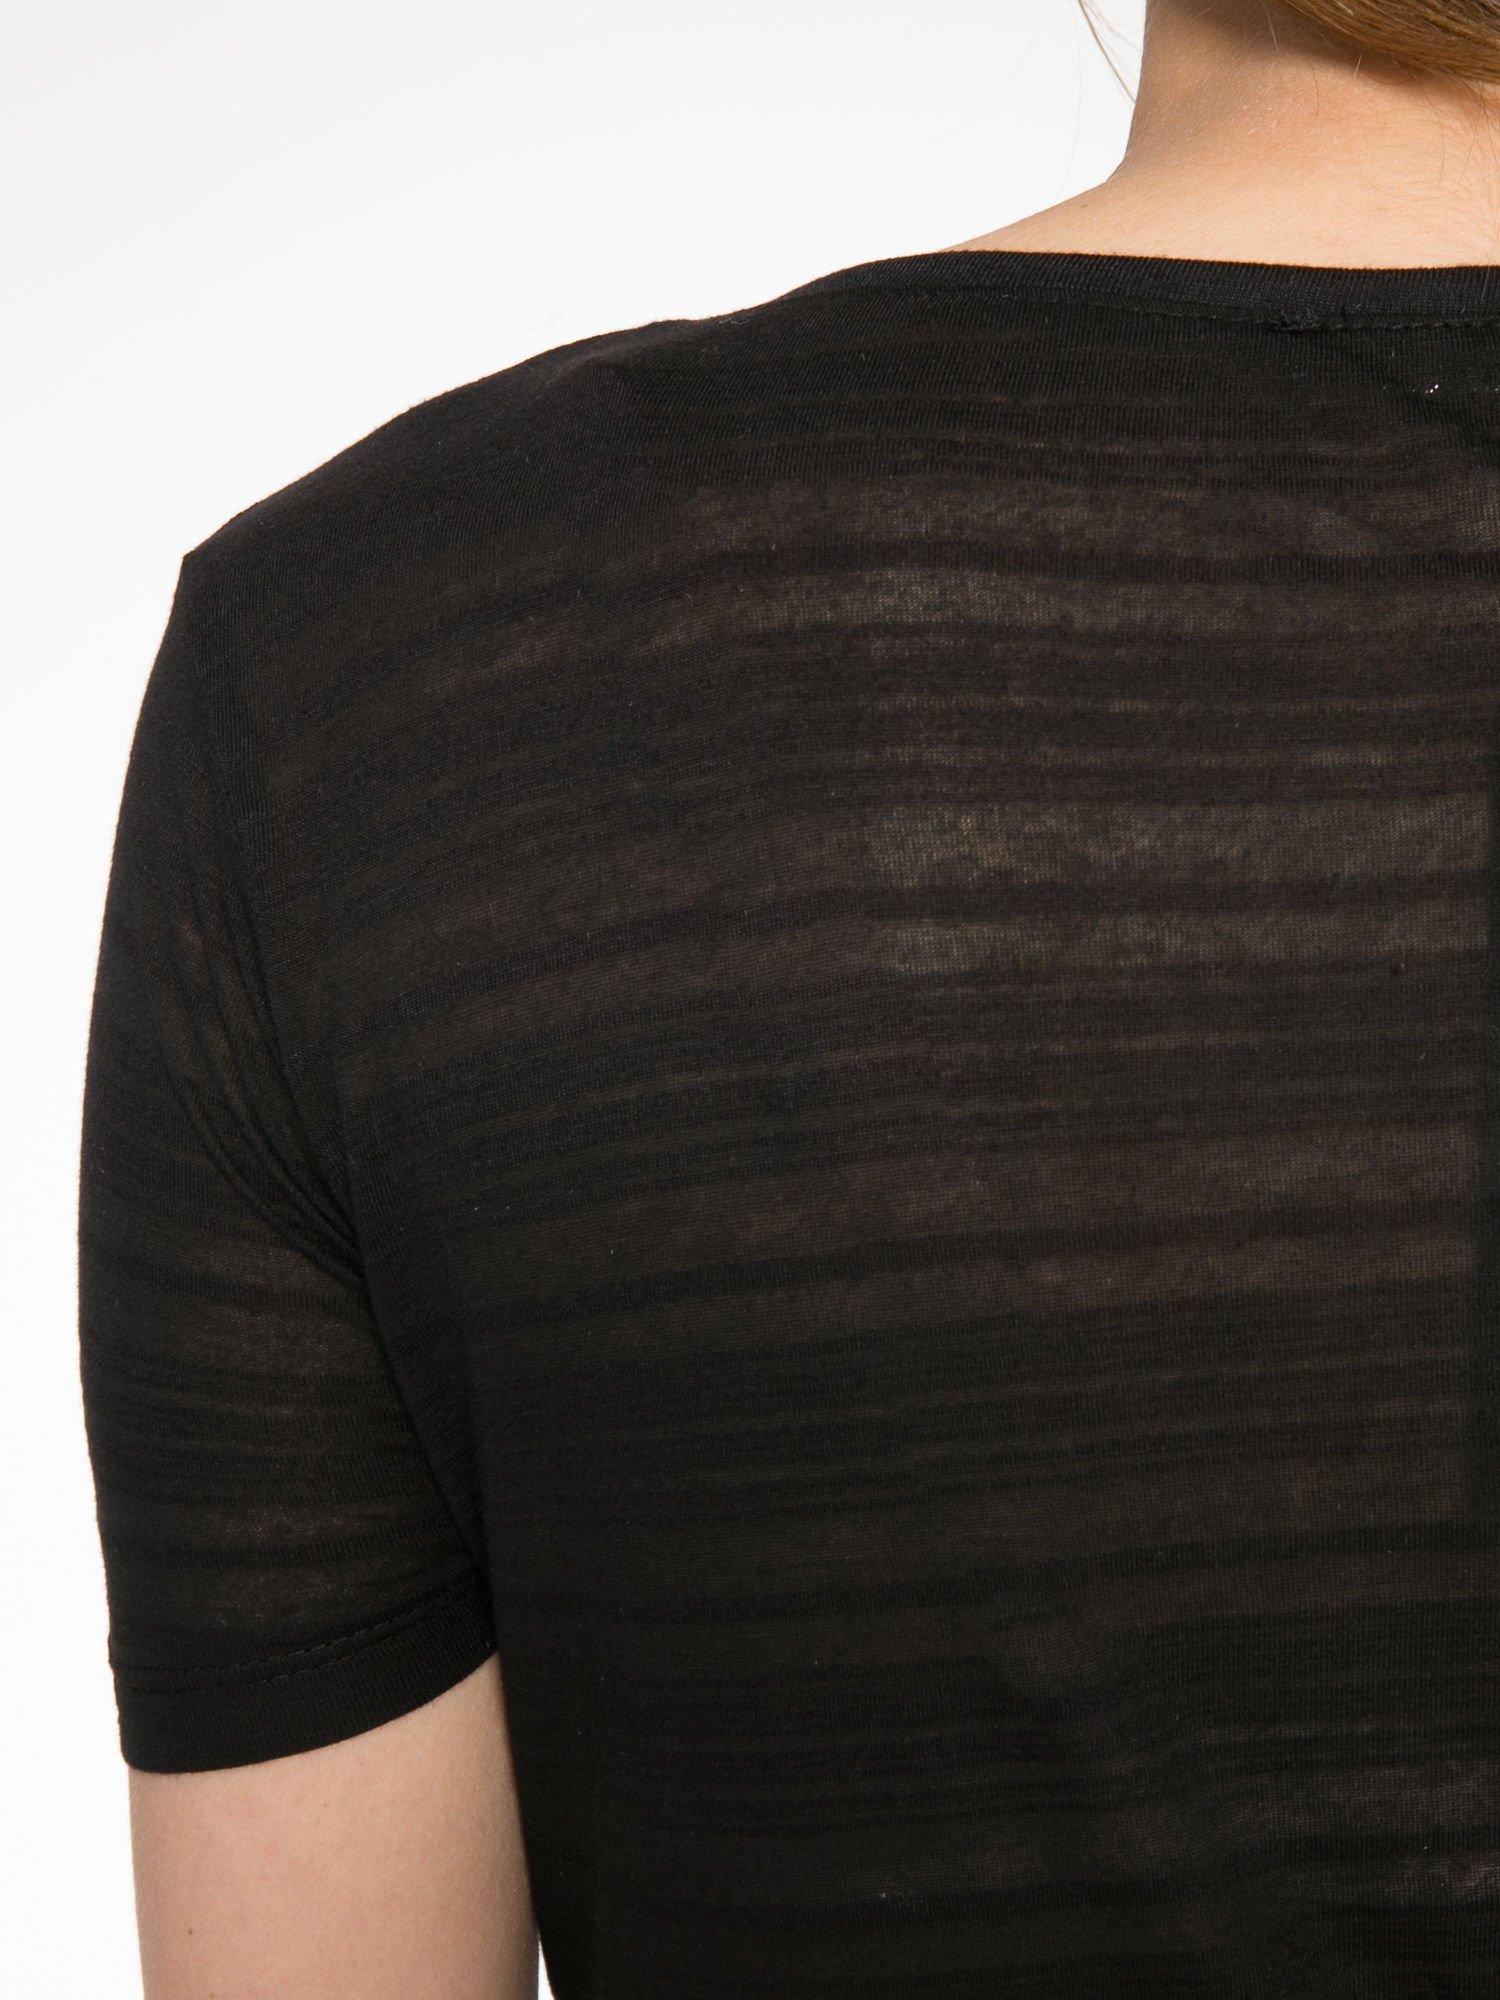 Czarny krótki t-shirt z napisem PARTY PERFECT FOREVER                                  zdj.                                  9